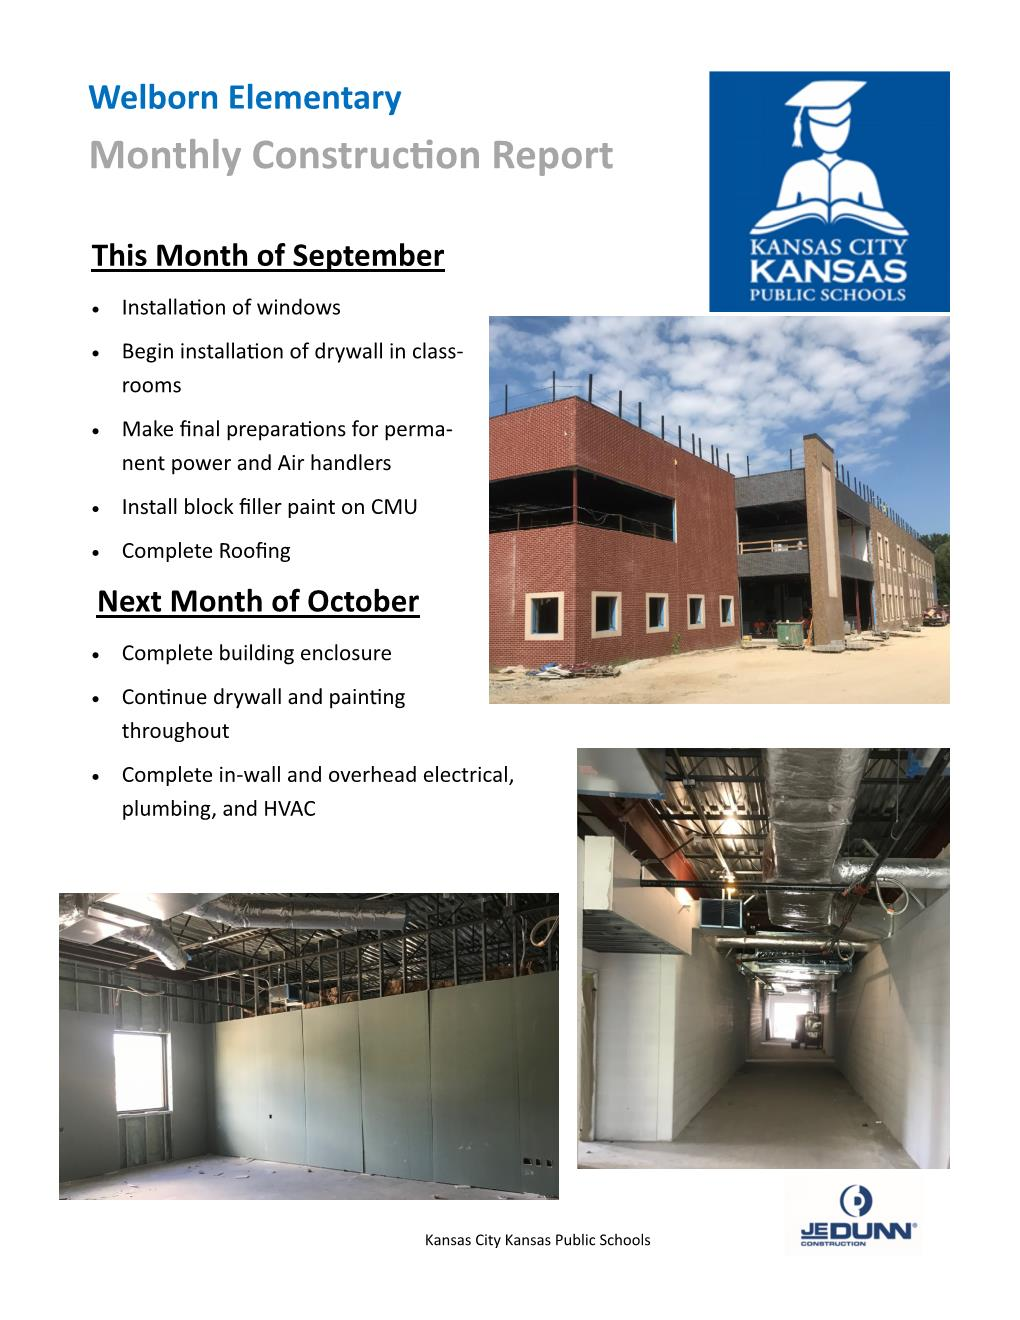 2018.09.18 - WP-08 September Photo Report Welborn.jpg